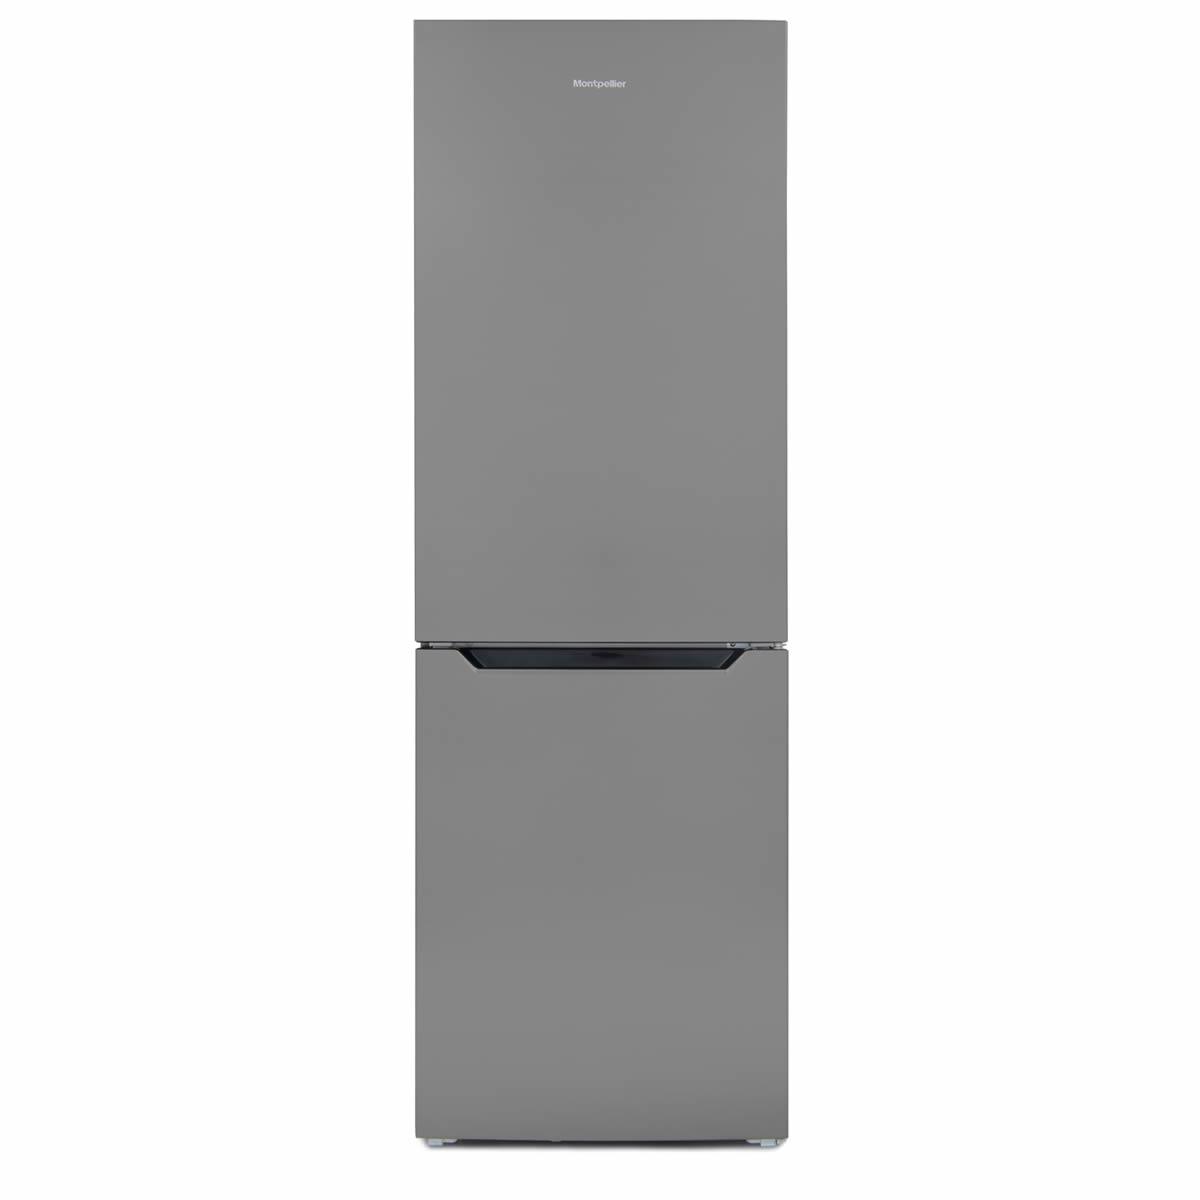 MS318MX 320litre Fridge Freezer NO FROST Class A+ Inox